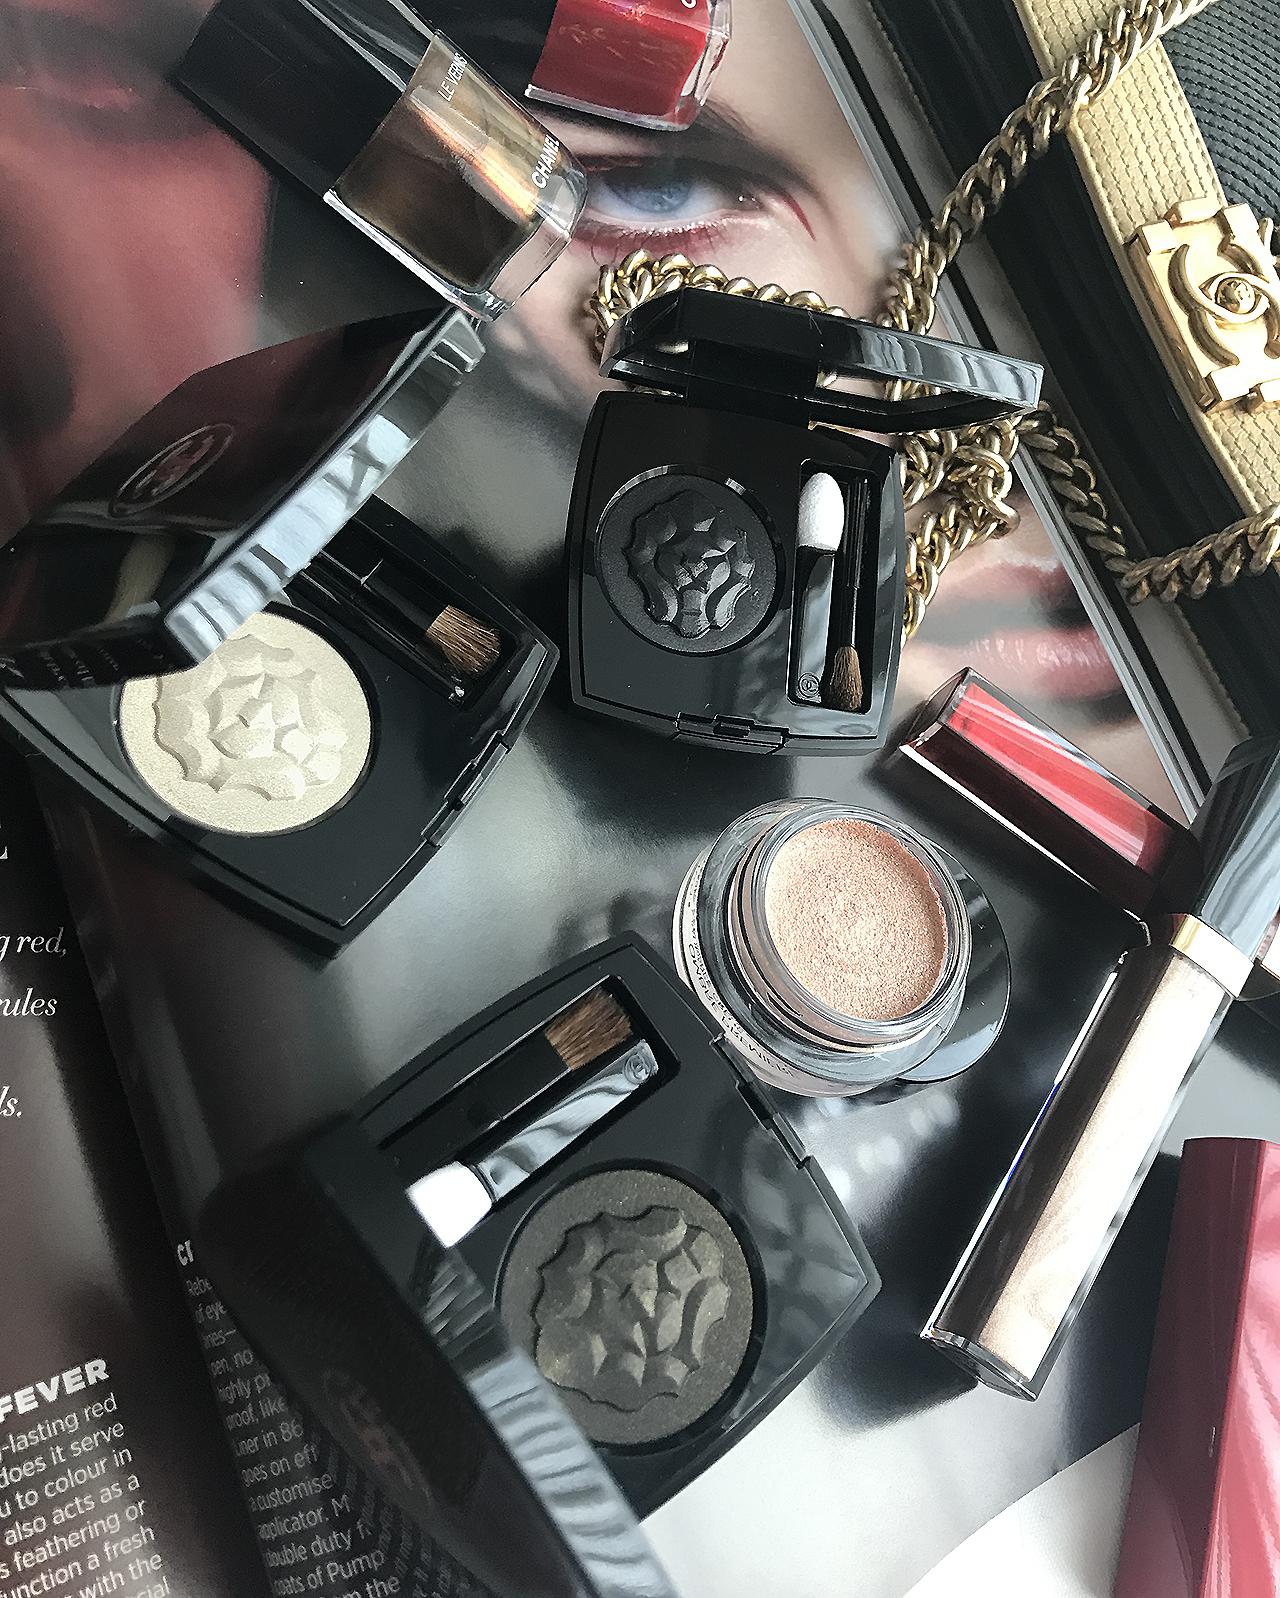 Collection Libre Maximalisme de Chanel Ombre Premiere Powder & Creme